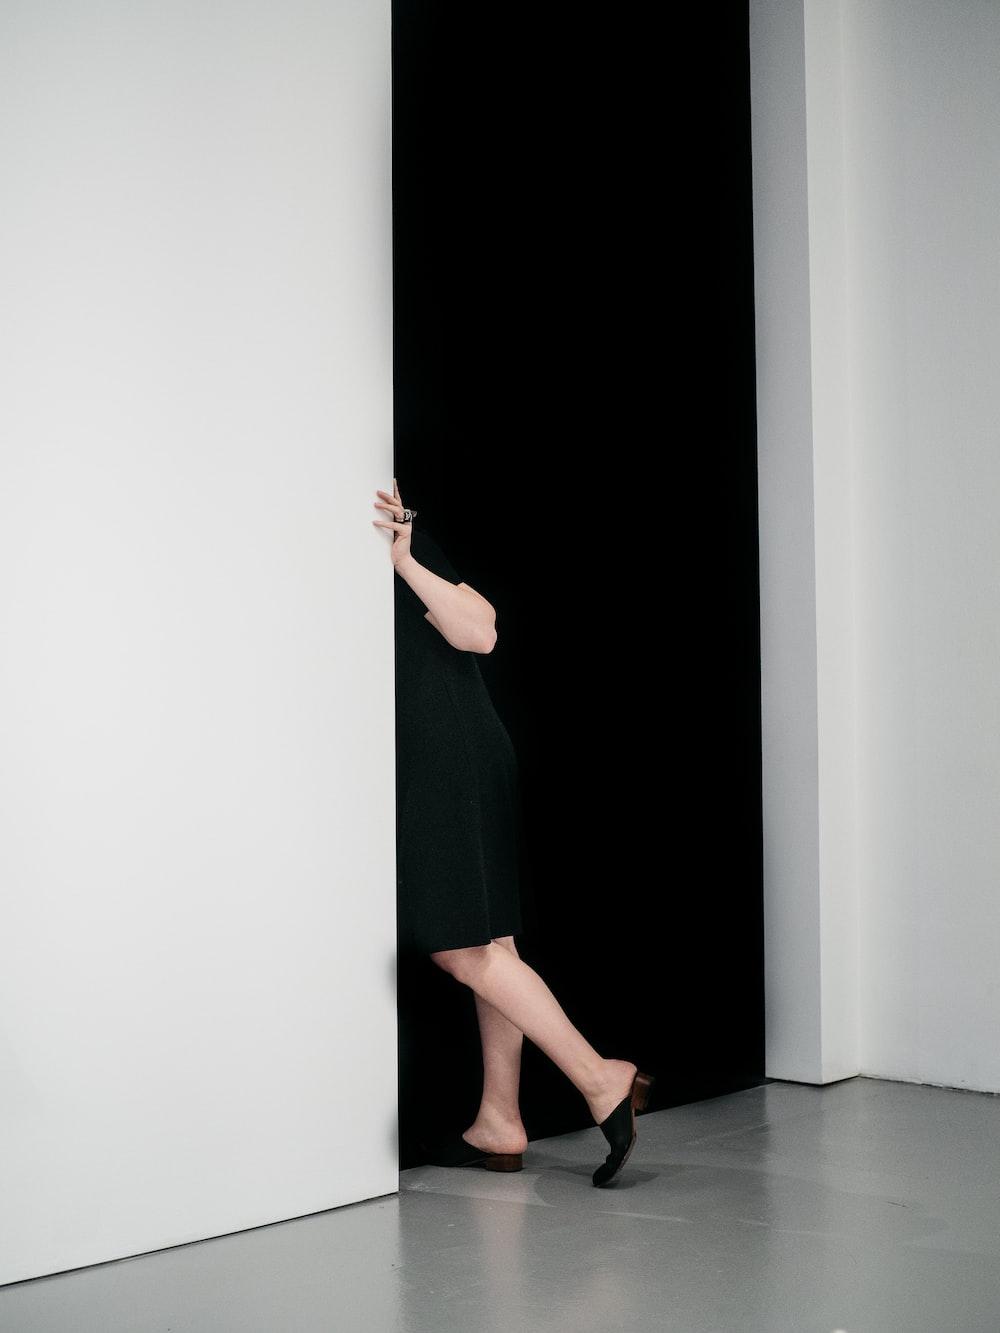 woman standing sneaking on door inside white painted room